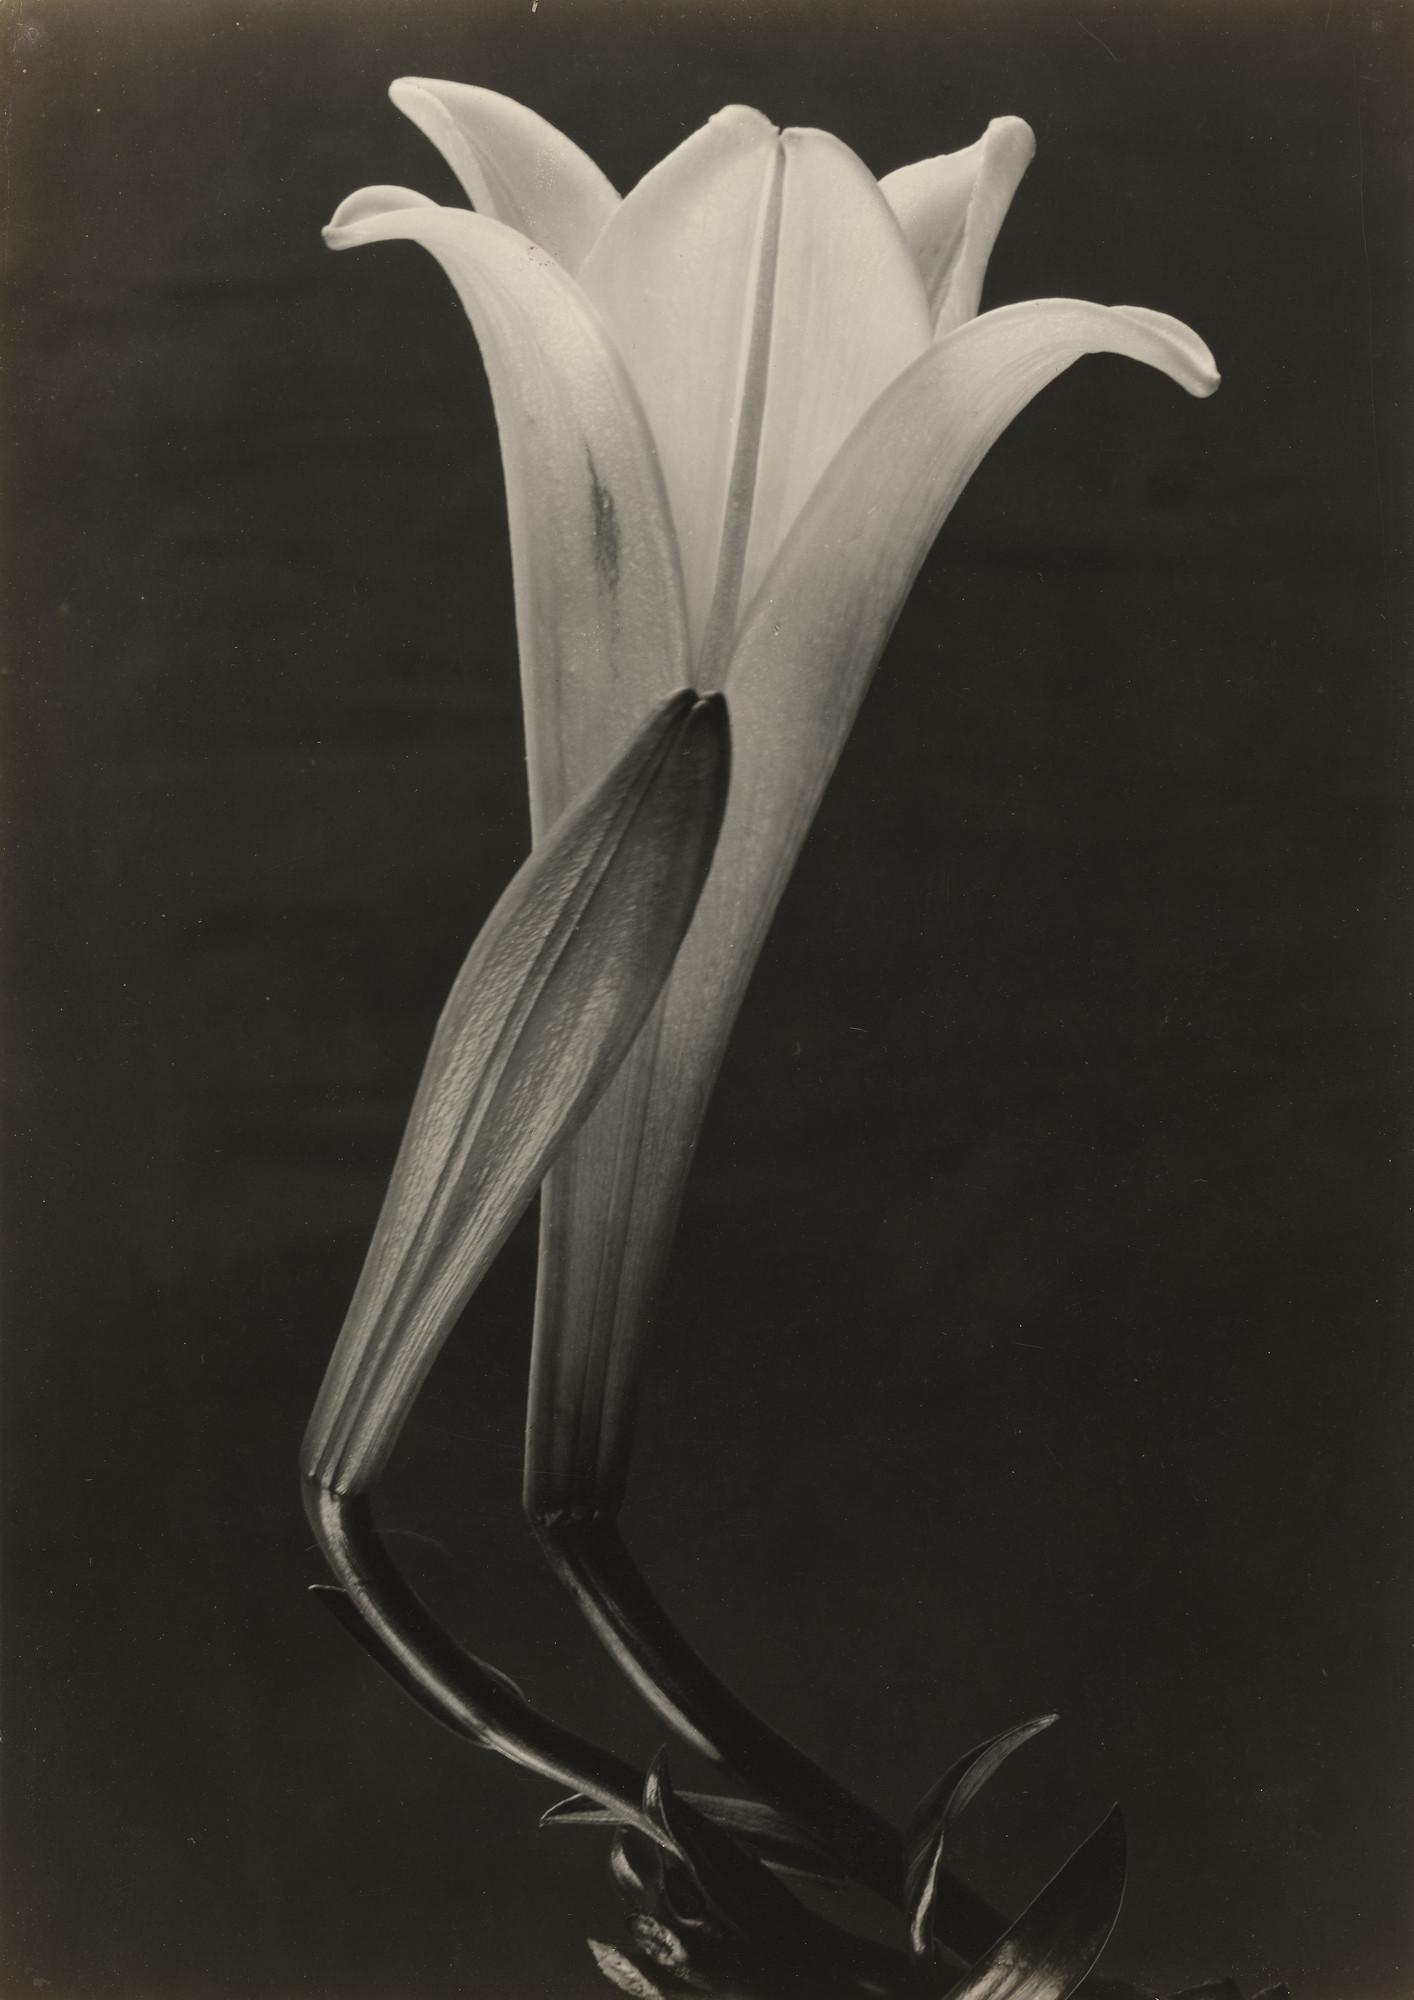 Tina modotti easter lily and bud c 1925 moma tina modotti easter lily and bud c 1925 izmirmasajfo